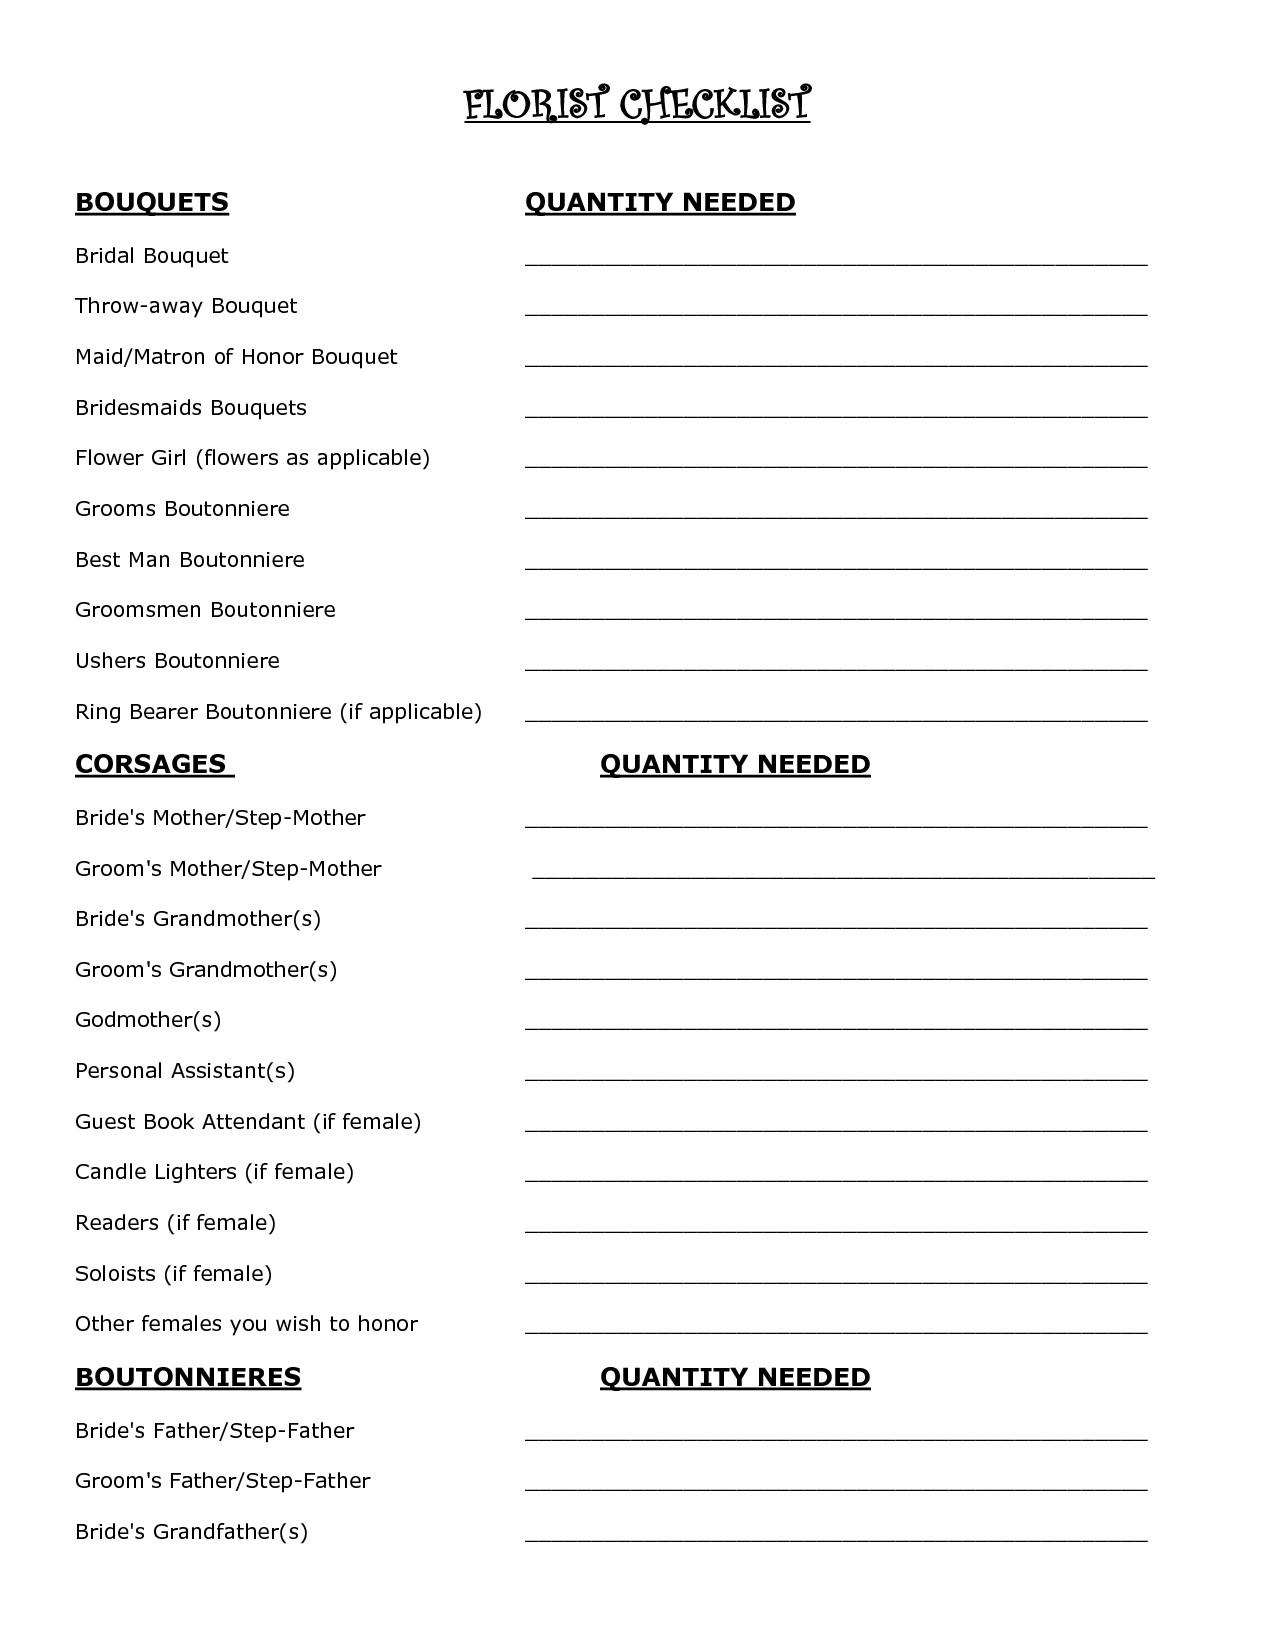 Wedding Flower Checklist Template Wedding Flowers Check List Google Search